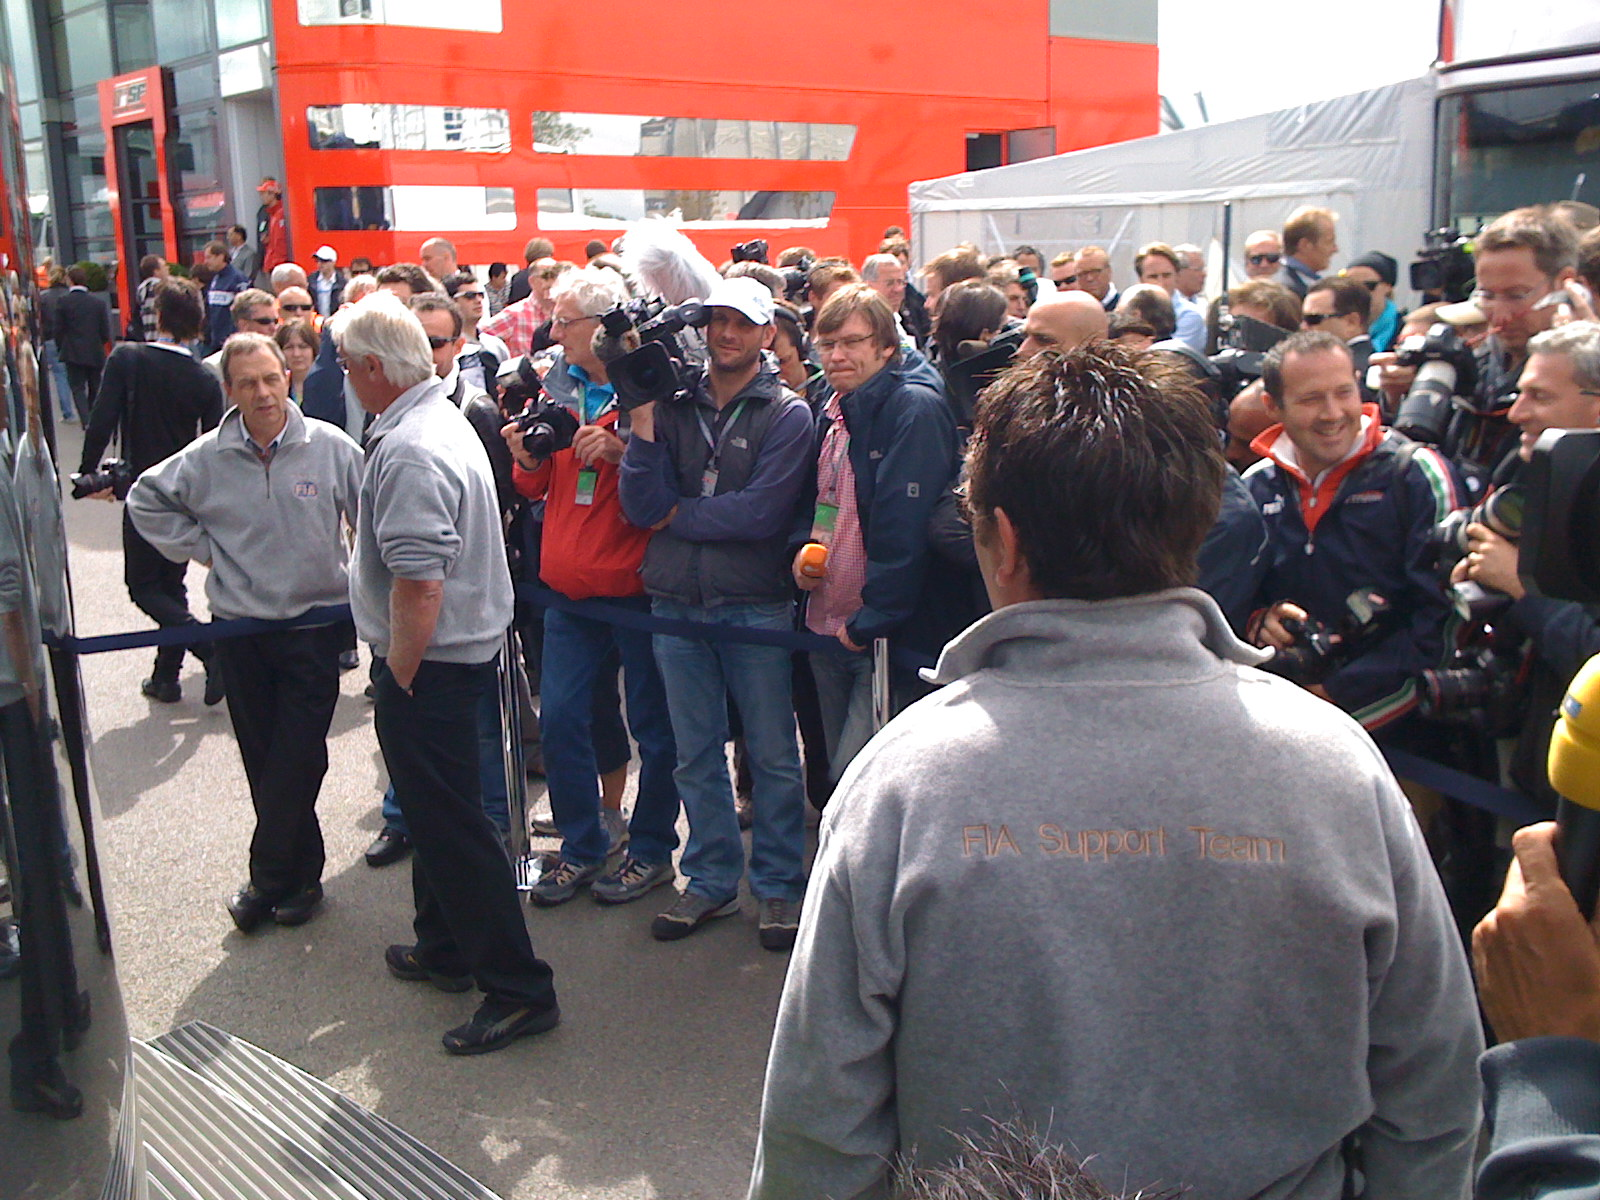 Media scrum waits for Mosley